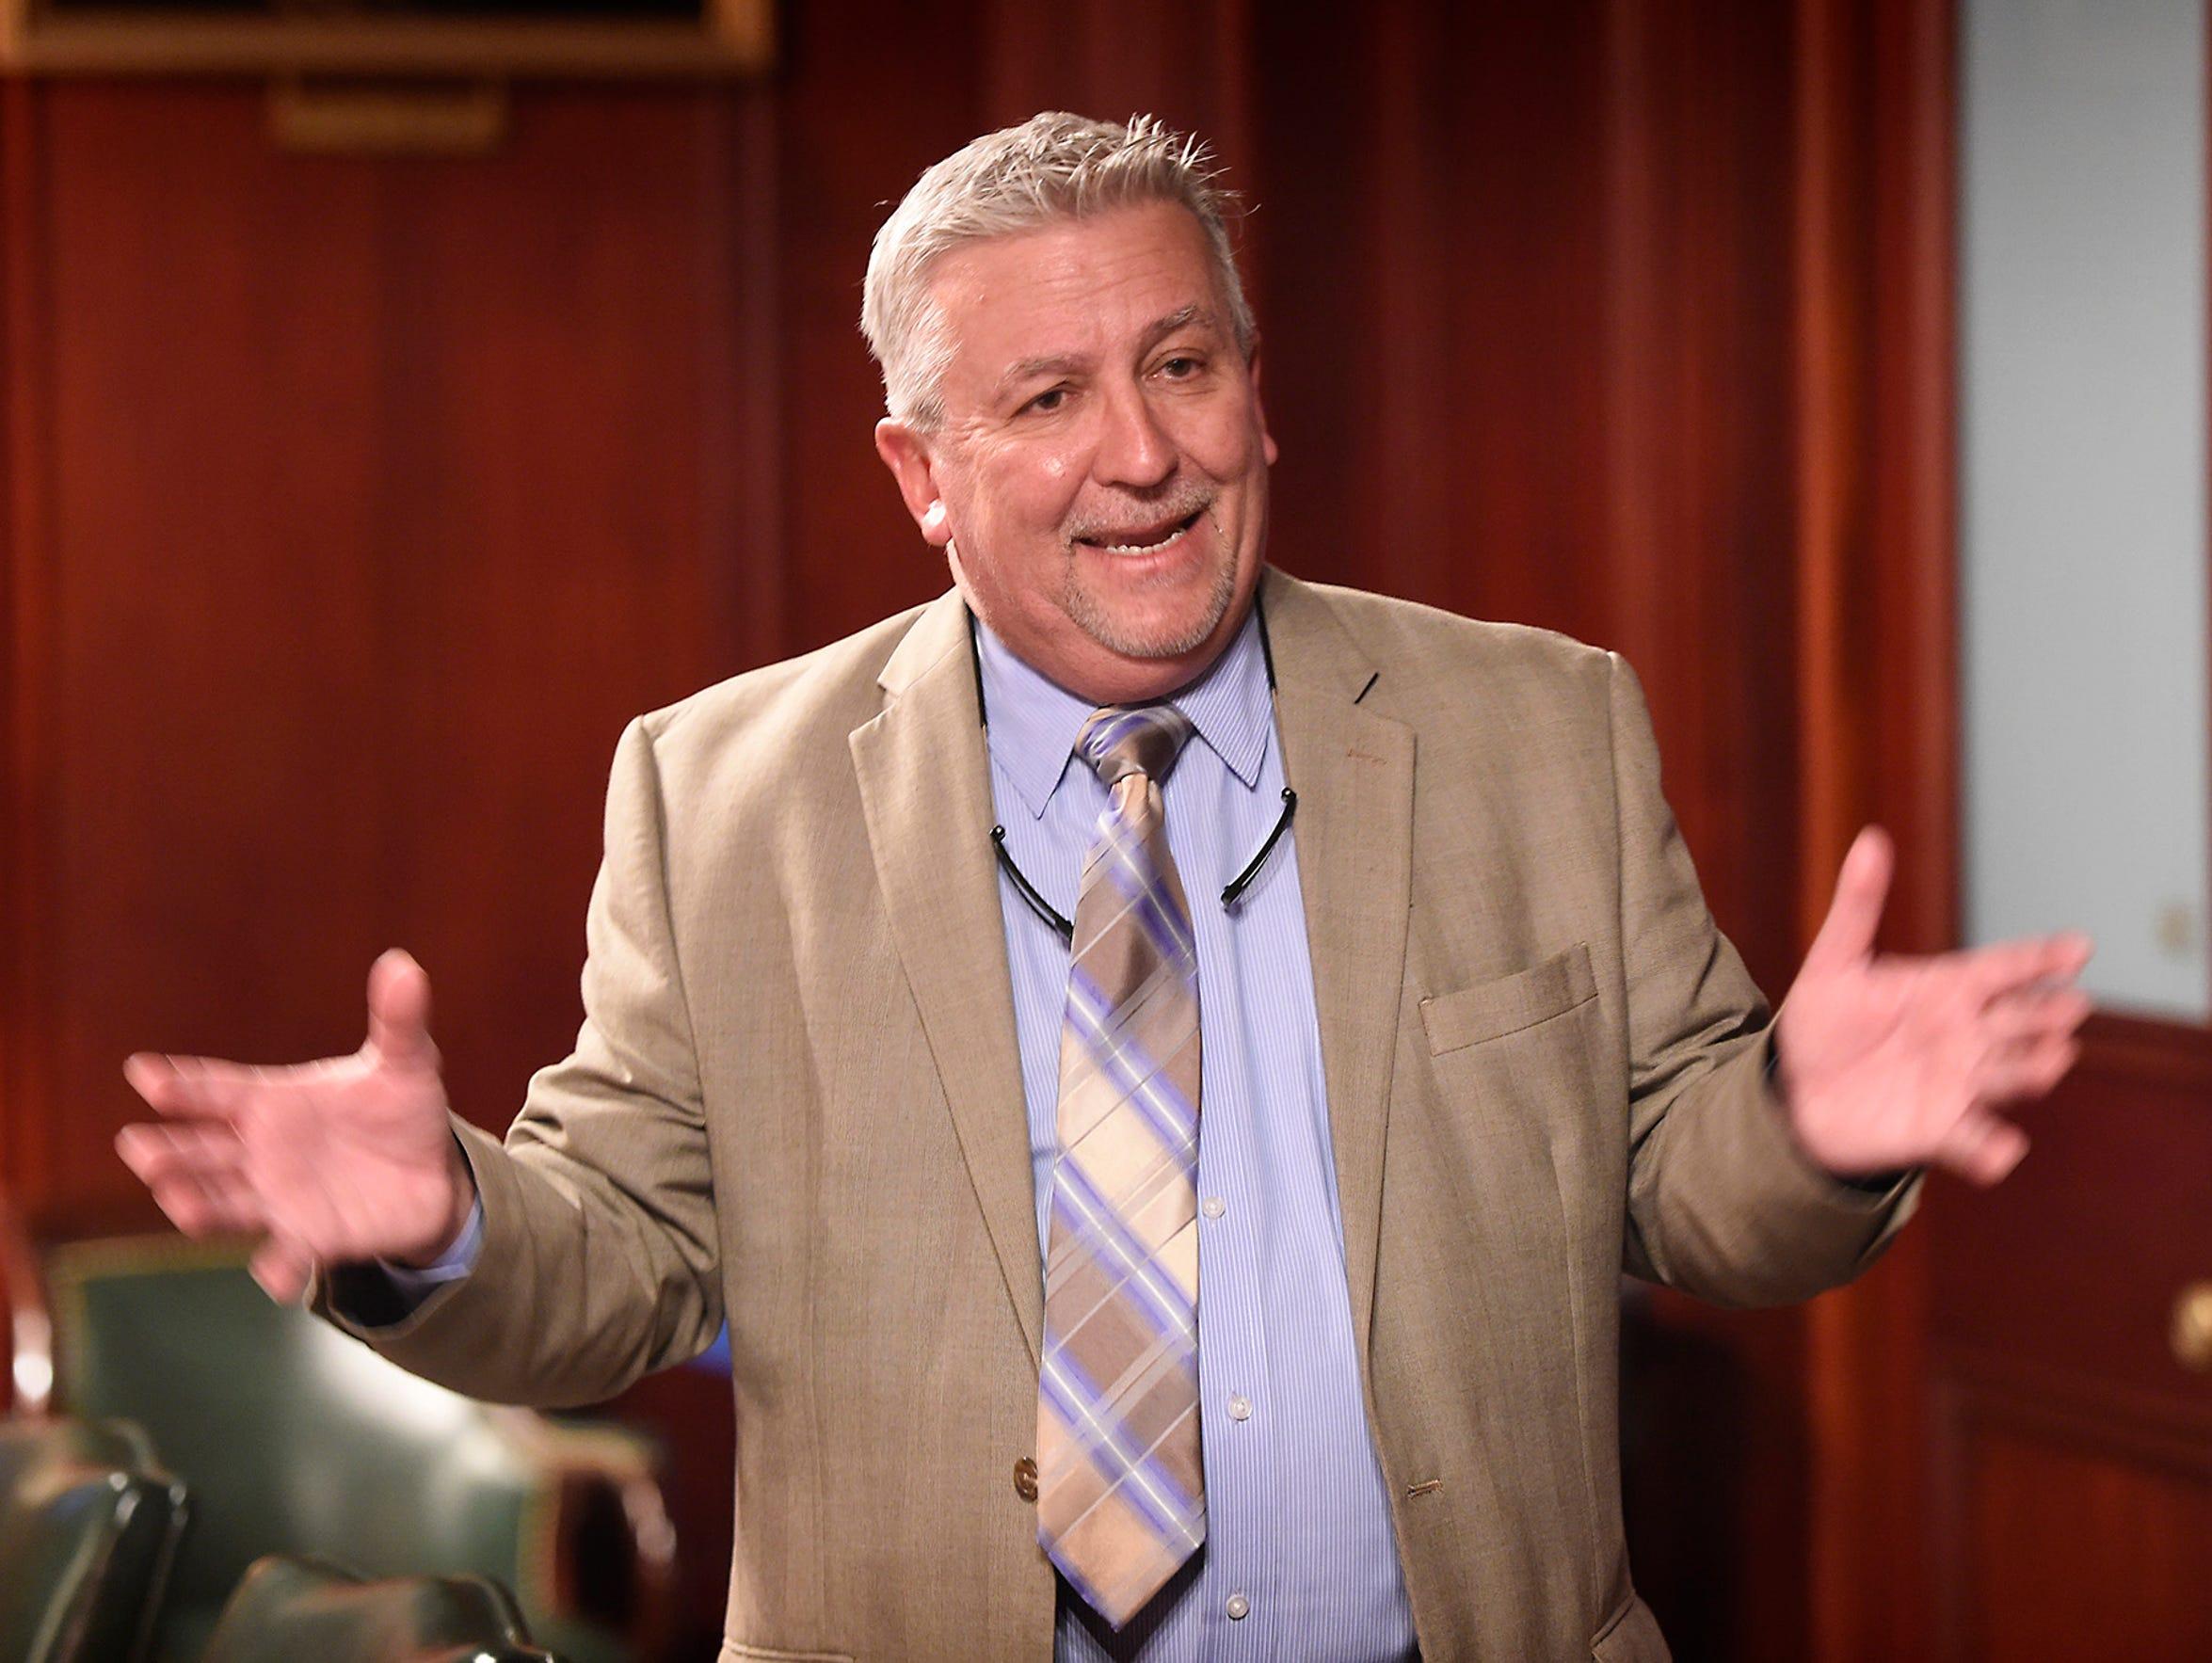 Senator Mike Folmer, R-48, a three-term state senator,